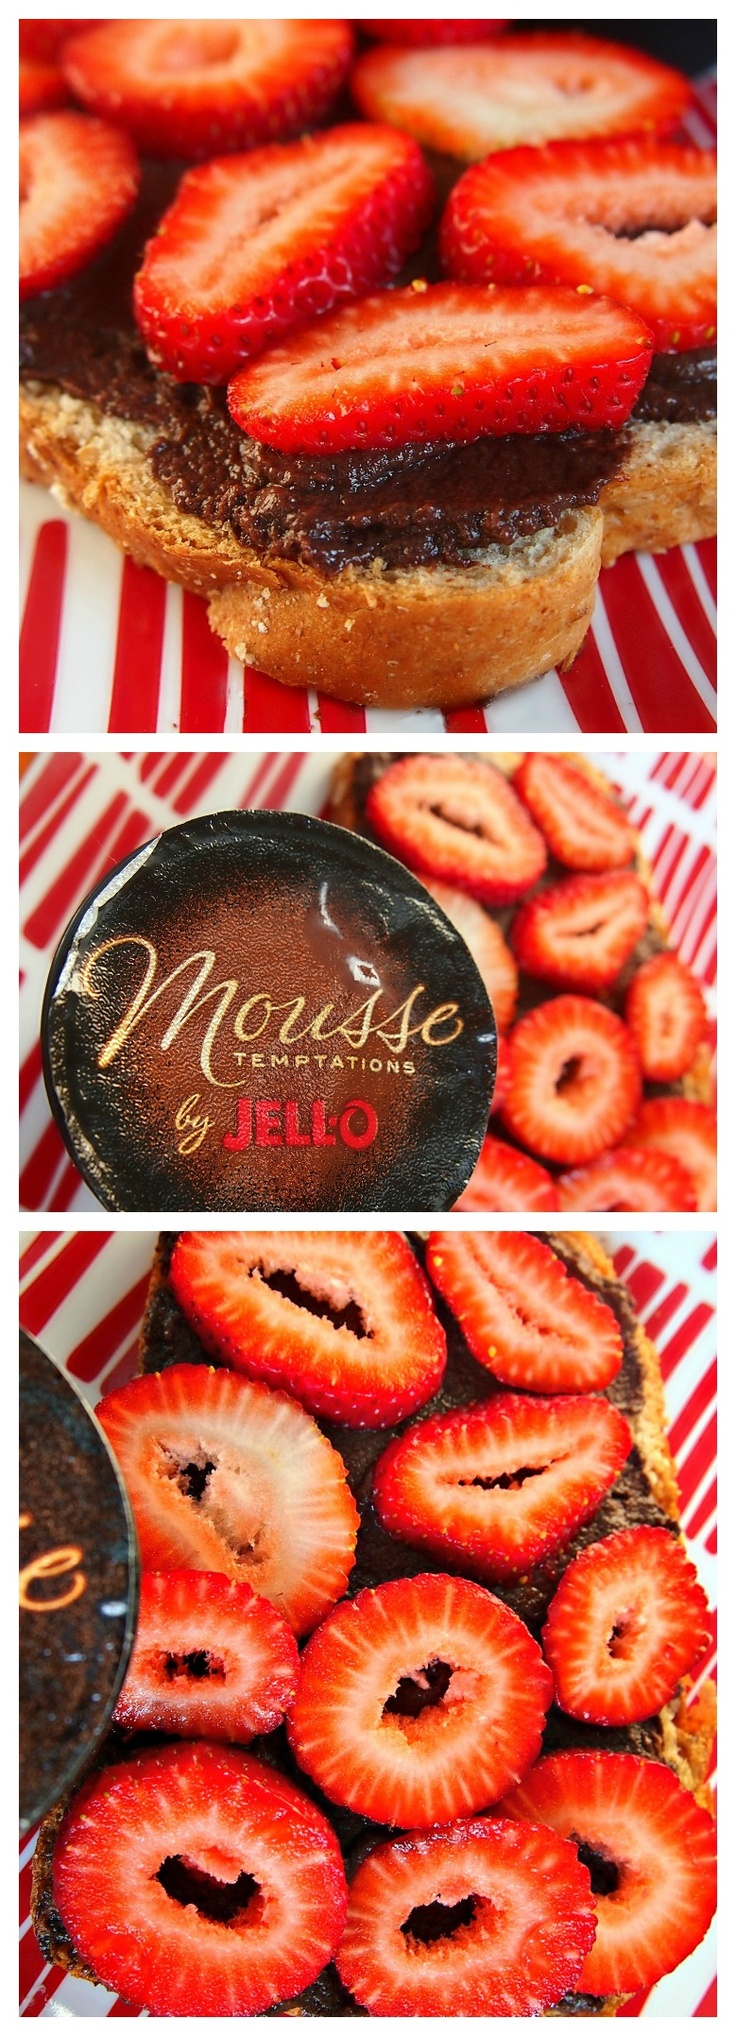 Dark Chocolate Strawberry ToastChocolate Strawberries, Healthy Breakfast, Dark Chocolates, Chocolates Strawberries, Grains Toast, Free Dark, Chocolates Mousse, Chocolates Covers Strawberries, Strawberries Toast